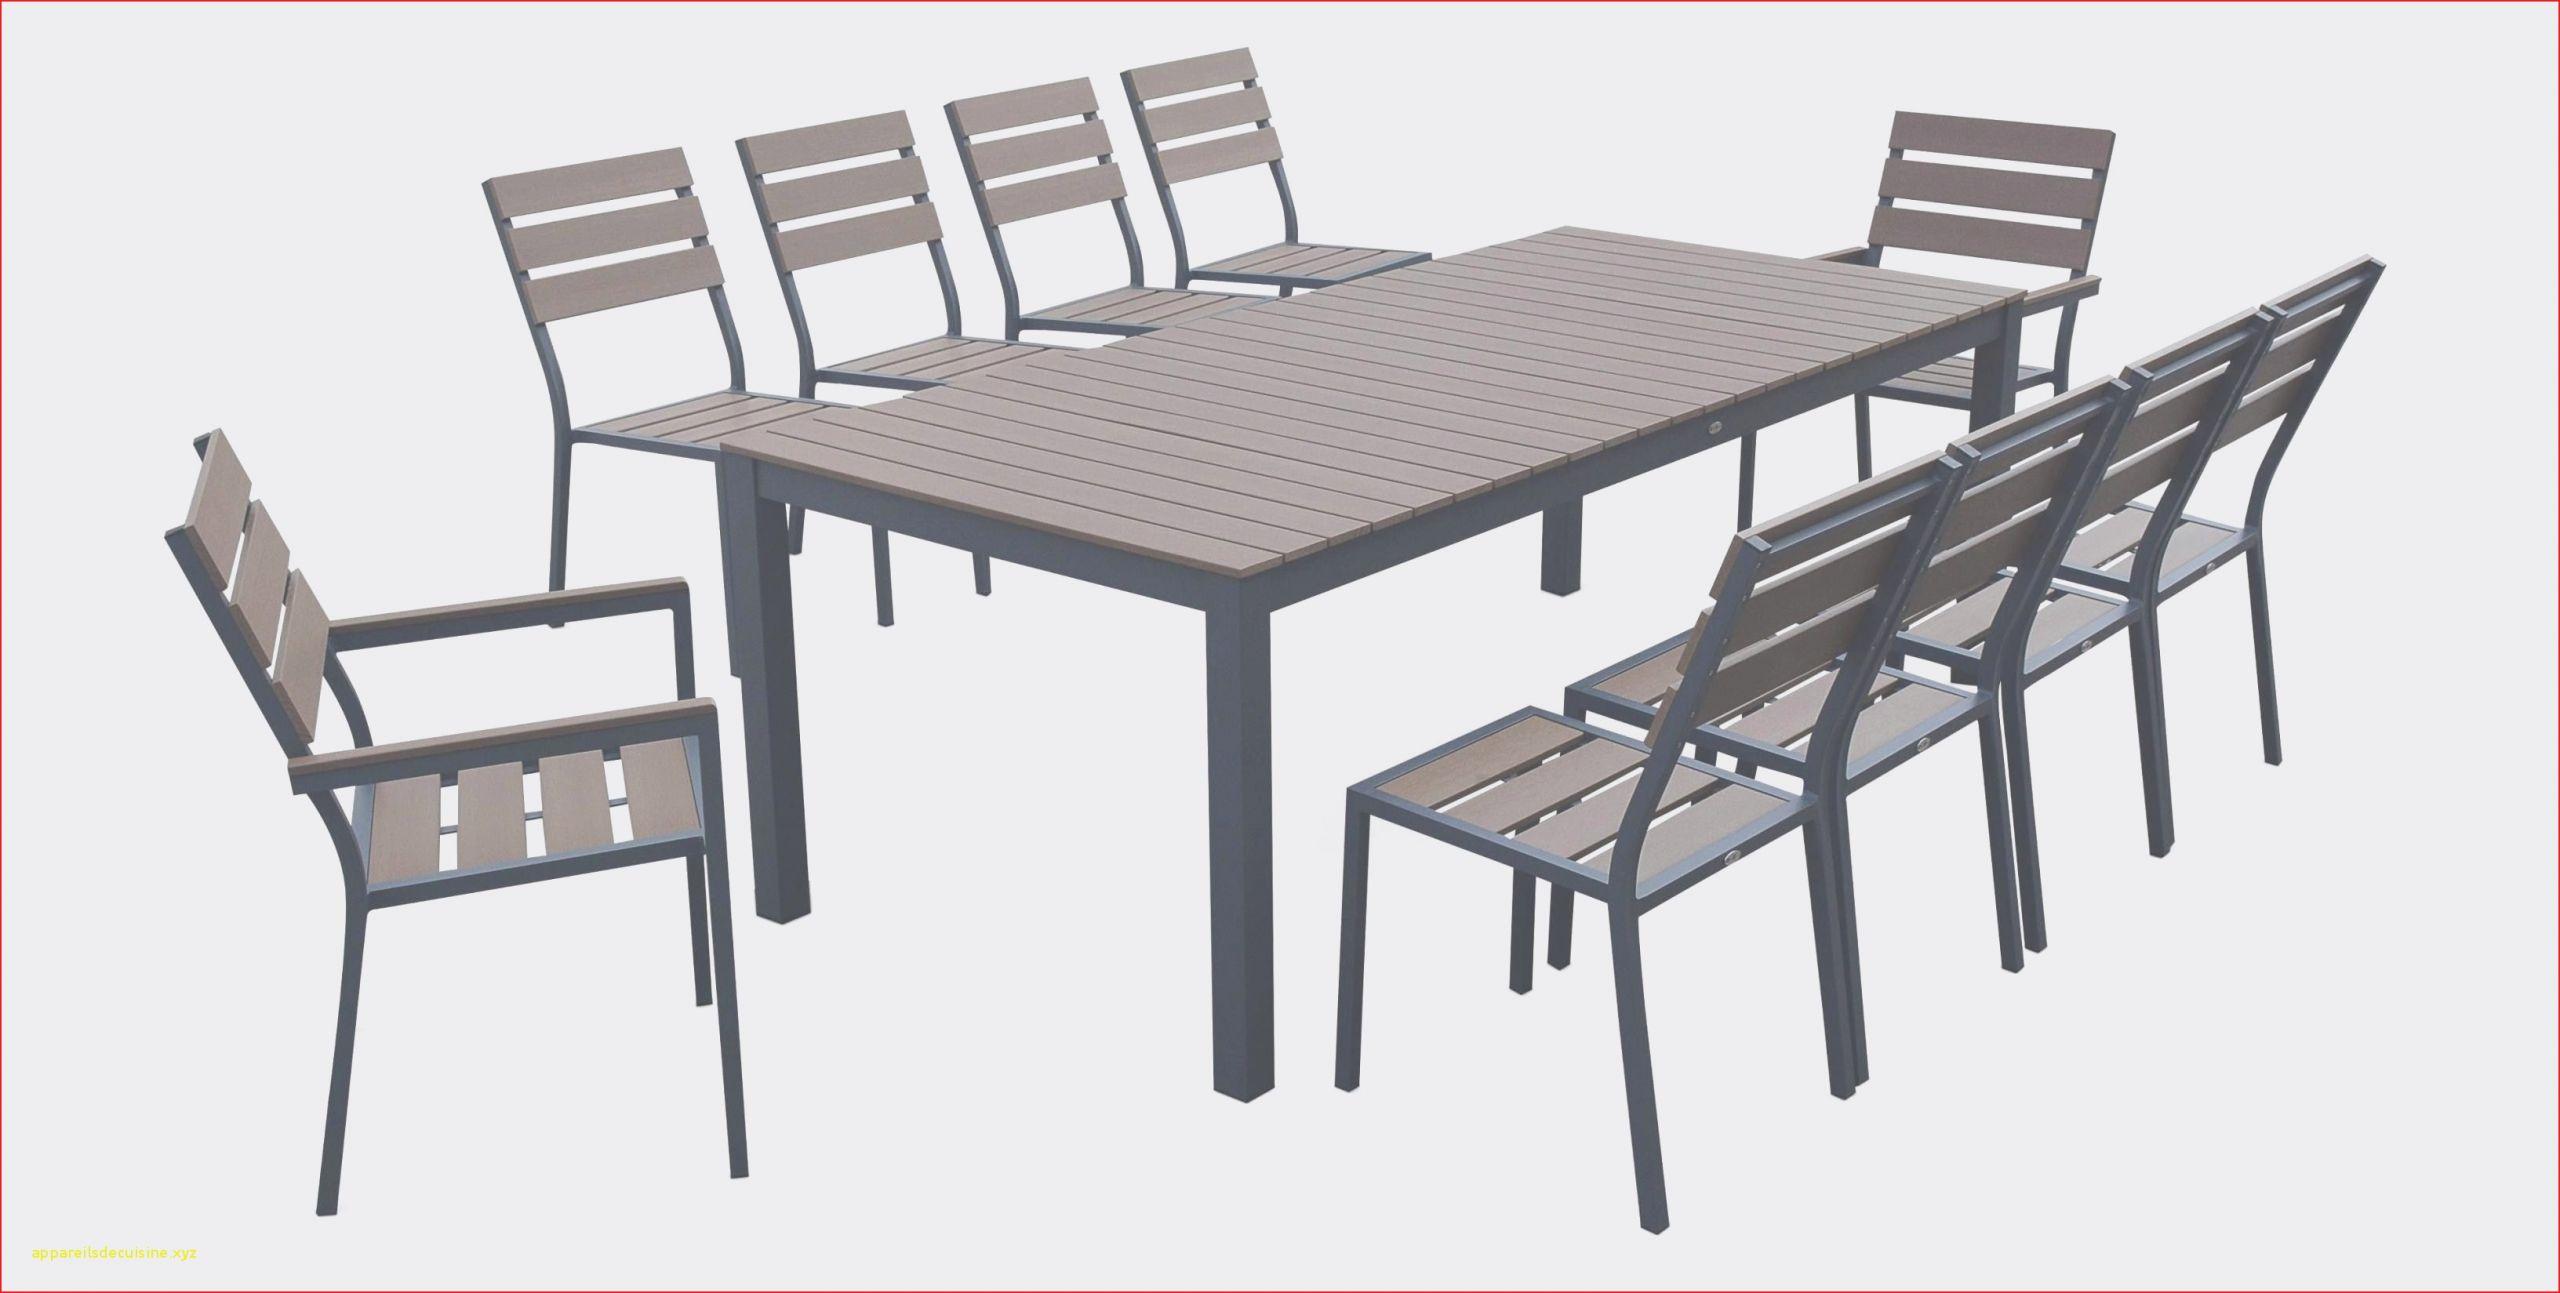 Table Et Chaise De Jardin Aluminium Beau Jardin Archives ... destiné Table De Jardin En Aluminium Avec Rallonge